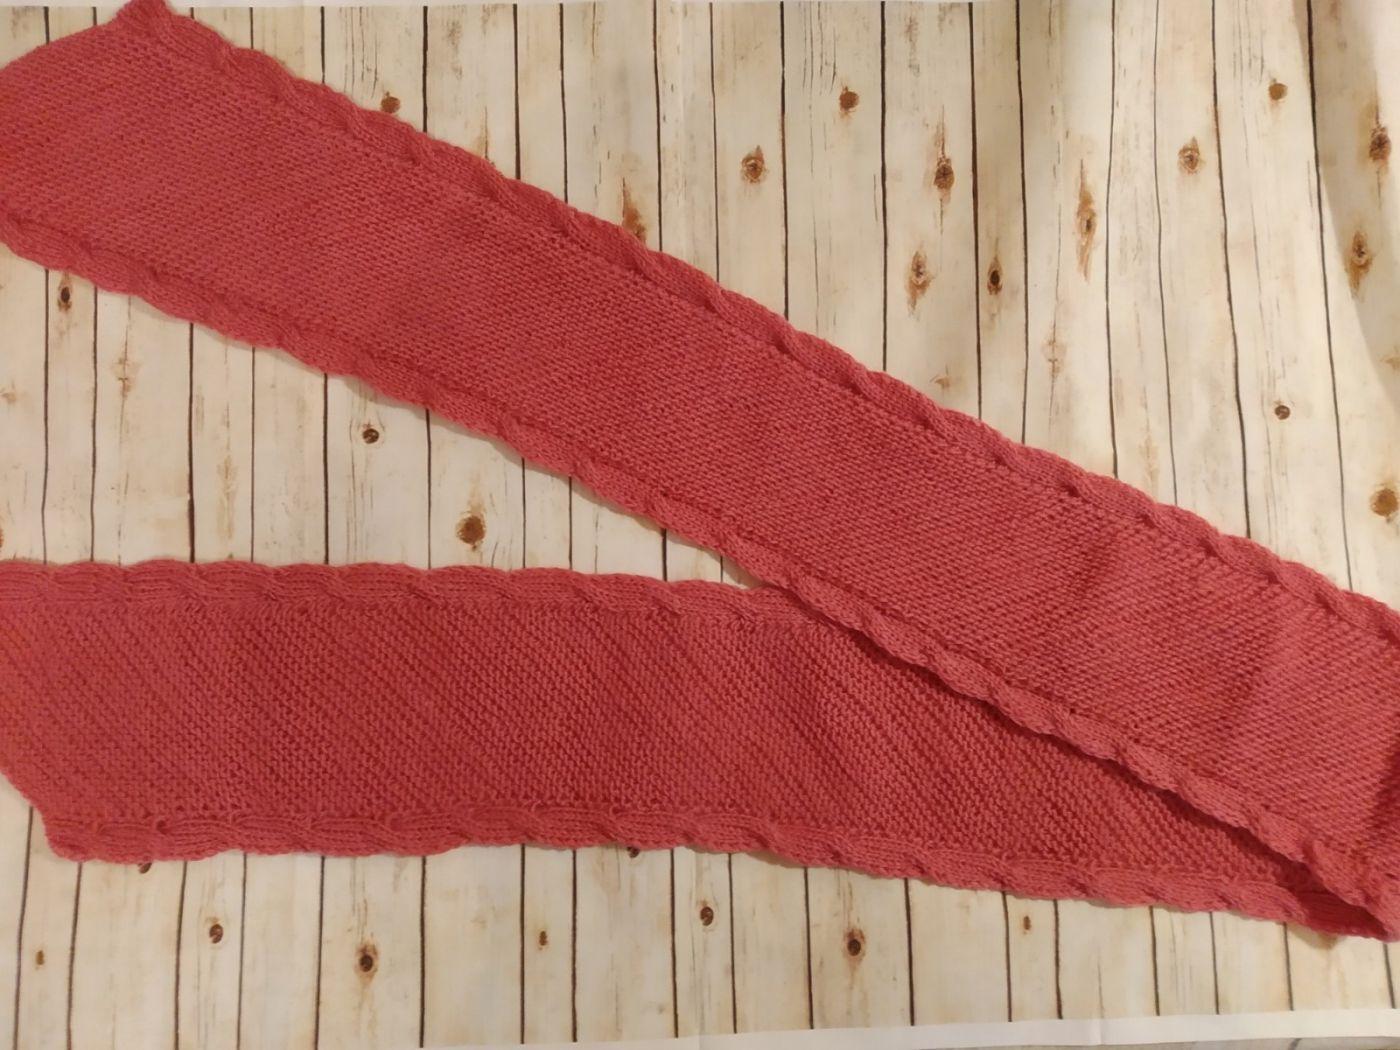 Двусторонний шарф. Шарф в подарок